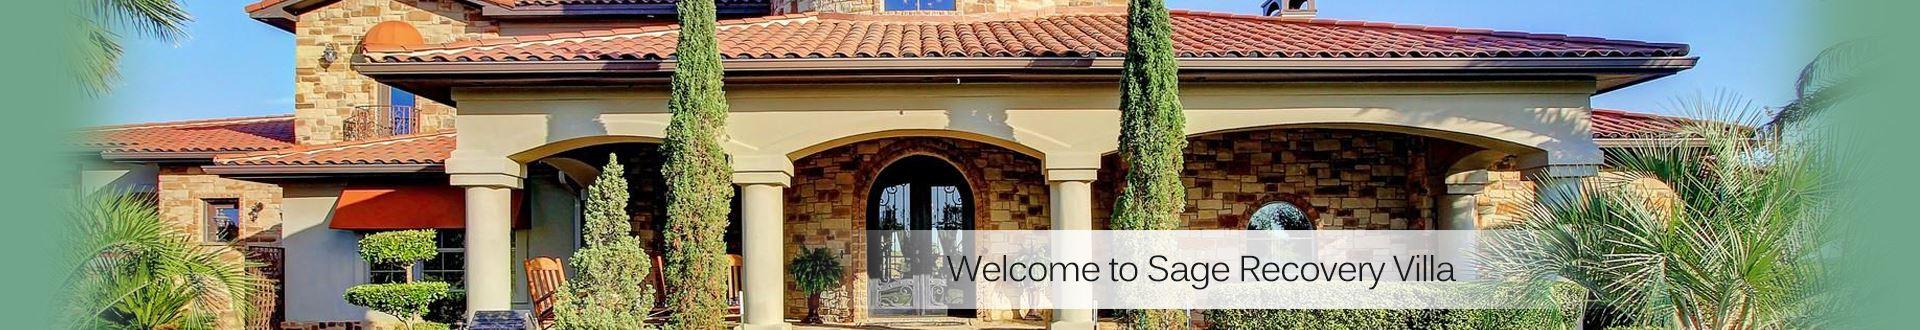 Sage Recovery Villa